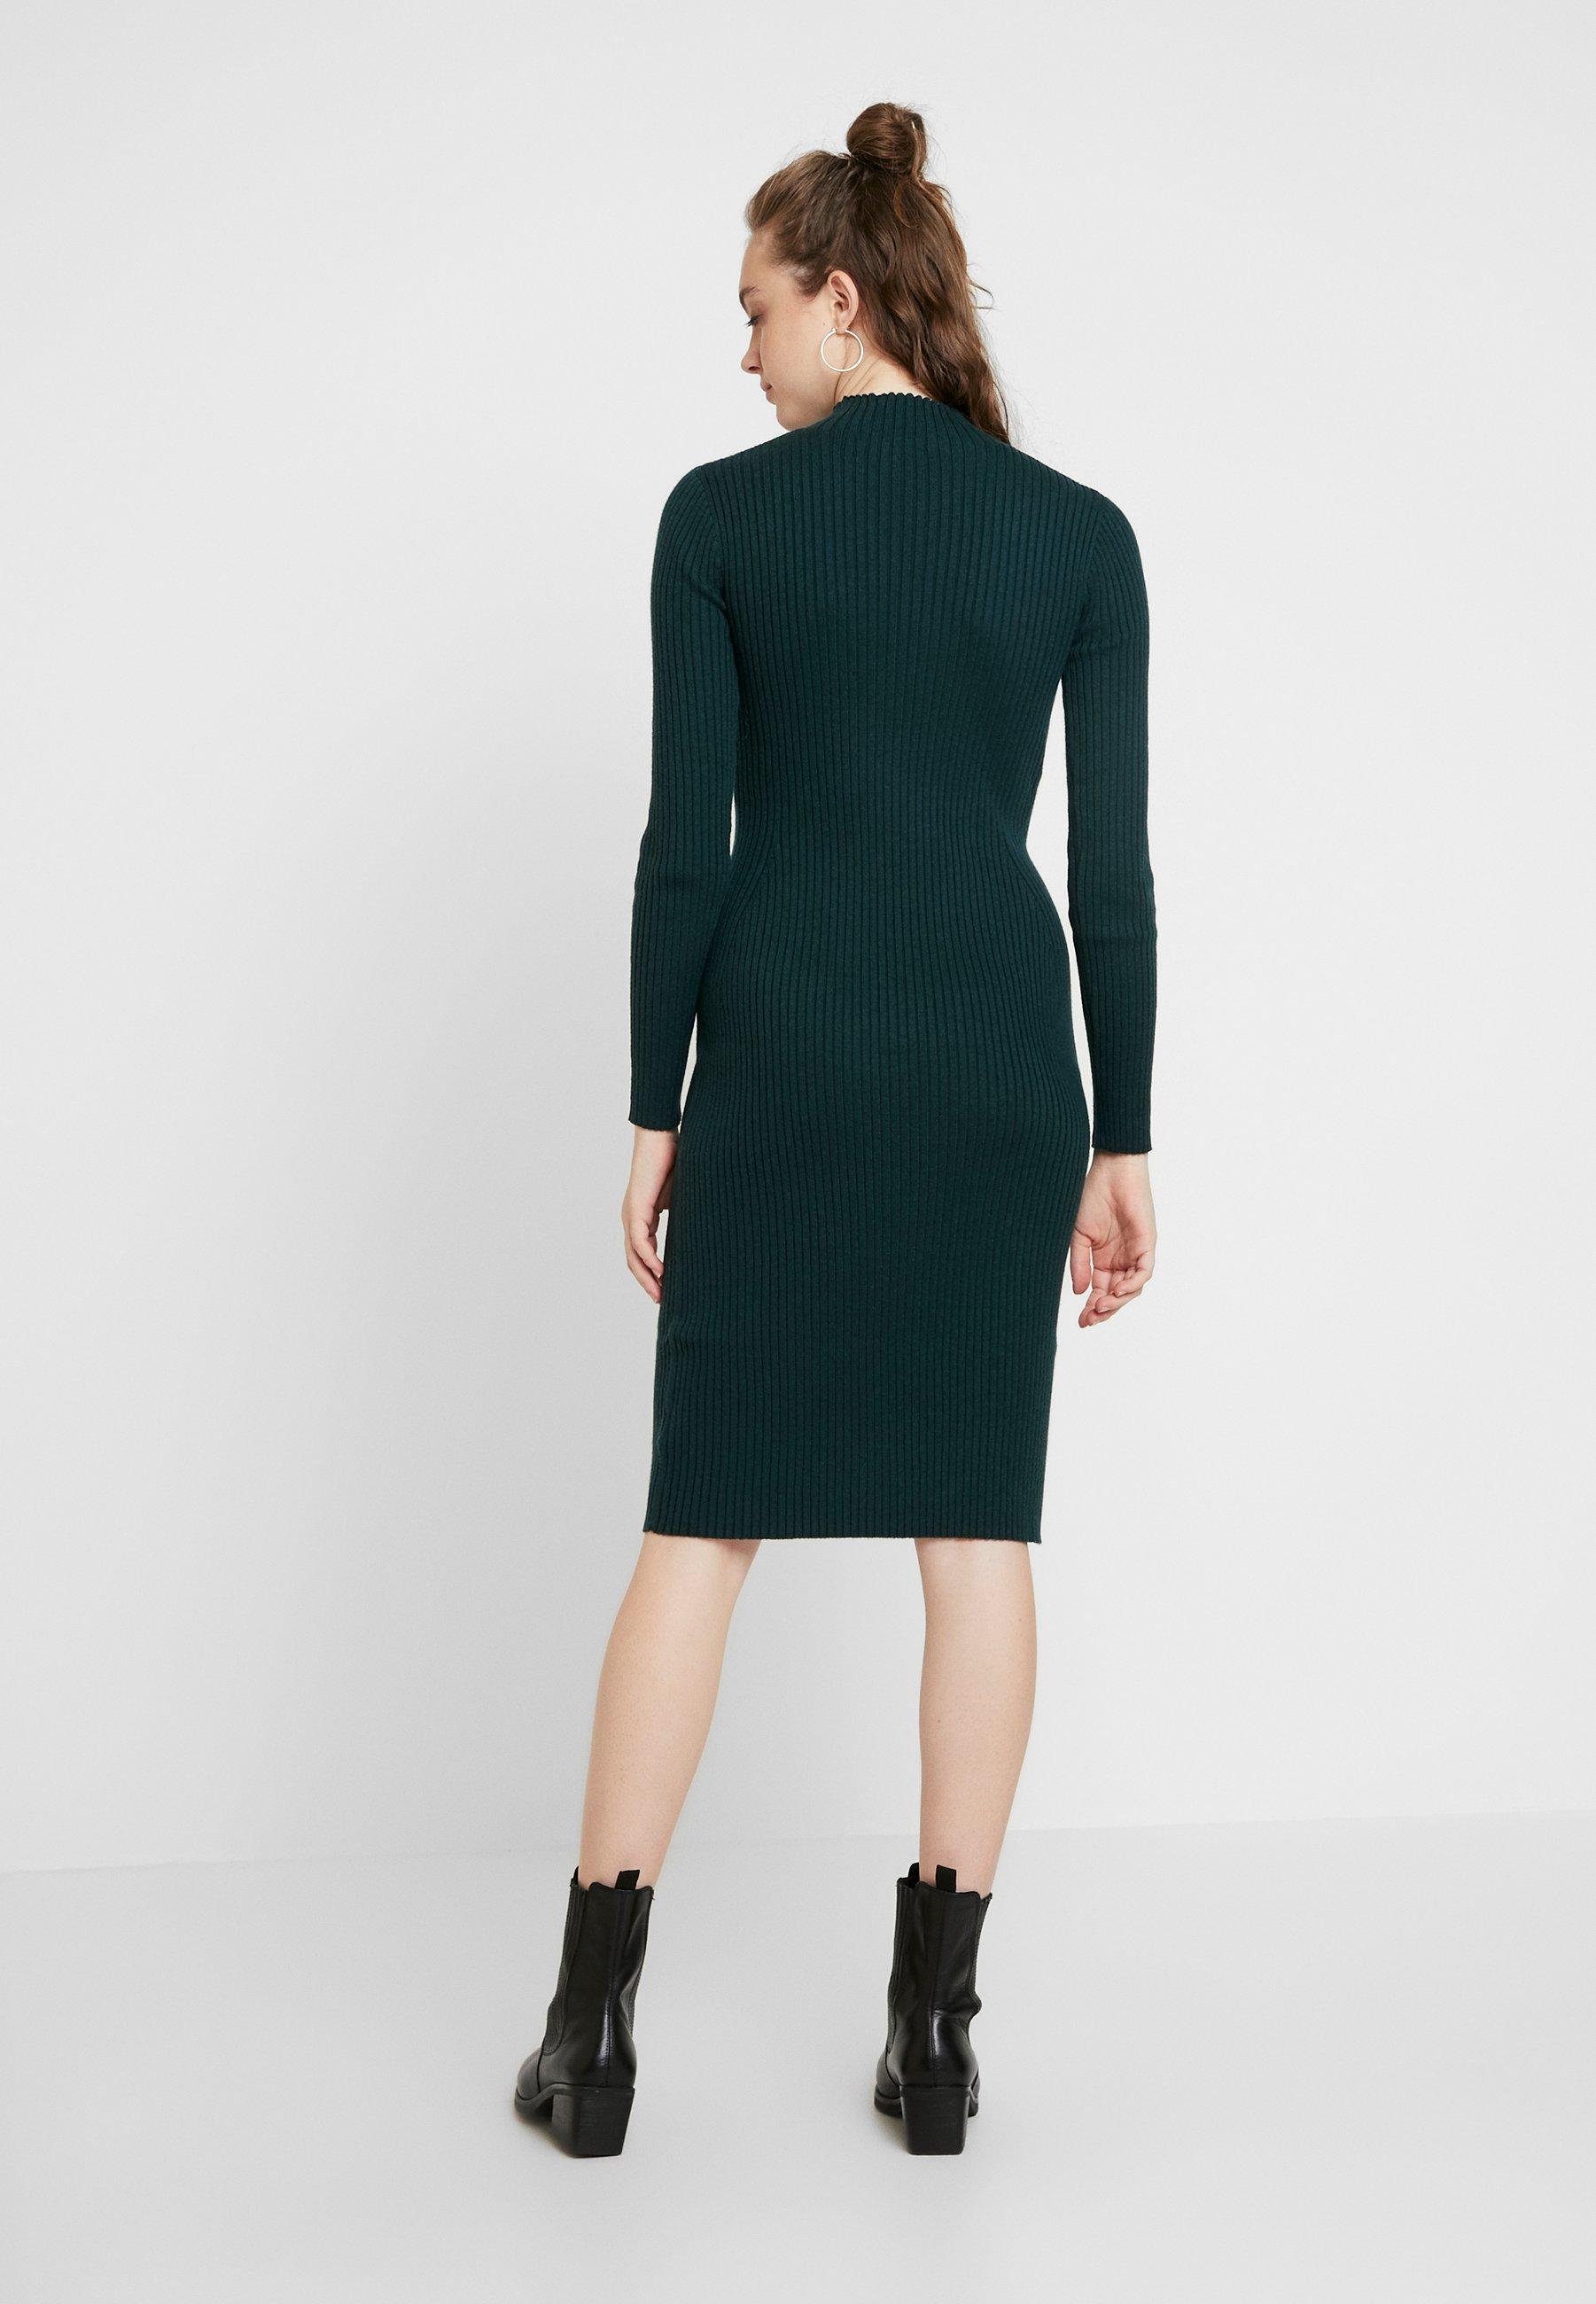 EDITED HADA DRESS - Abito in maglia grün/dunkelgrün